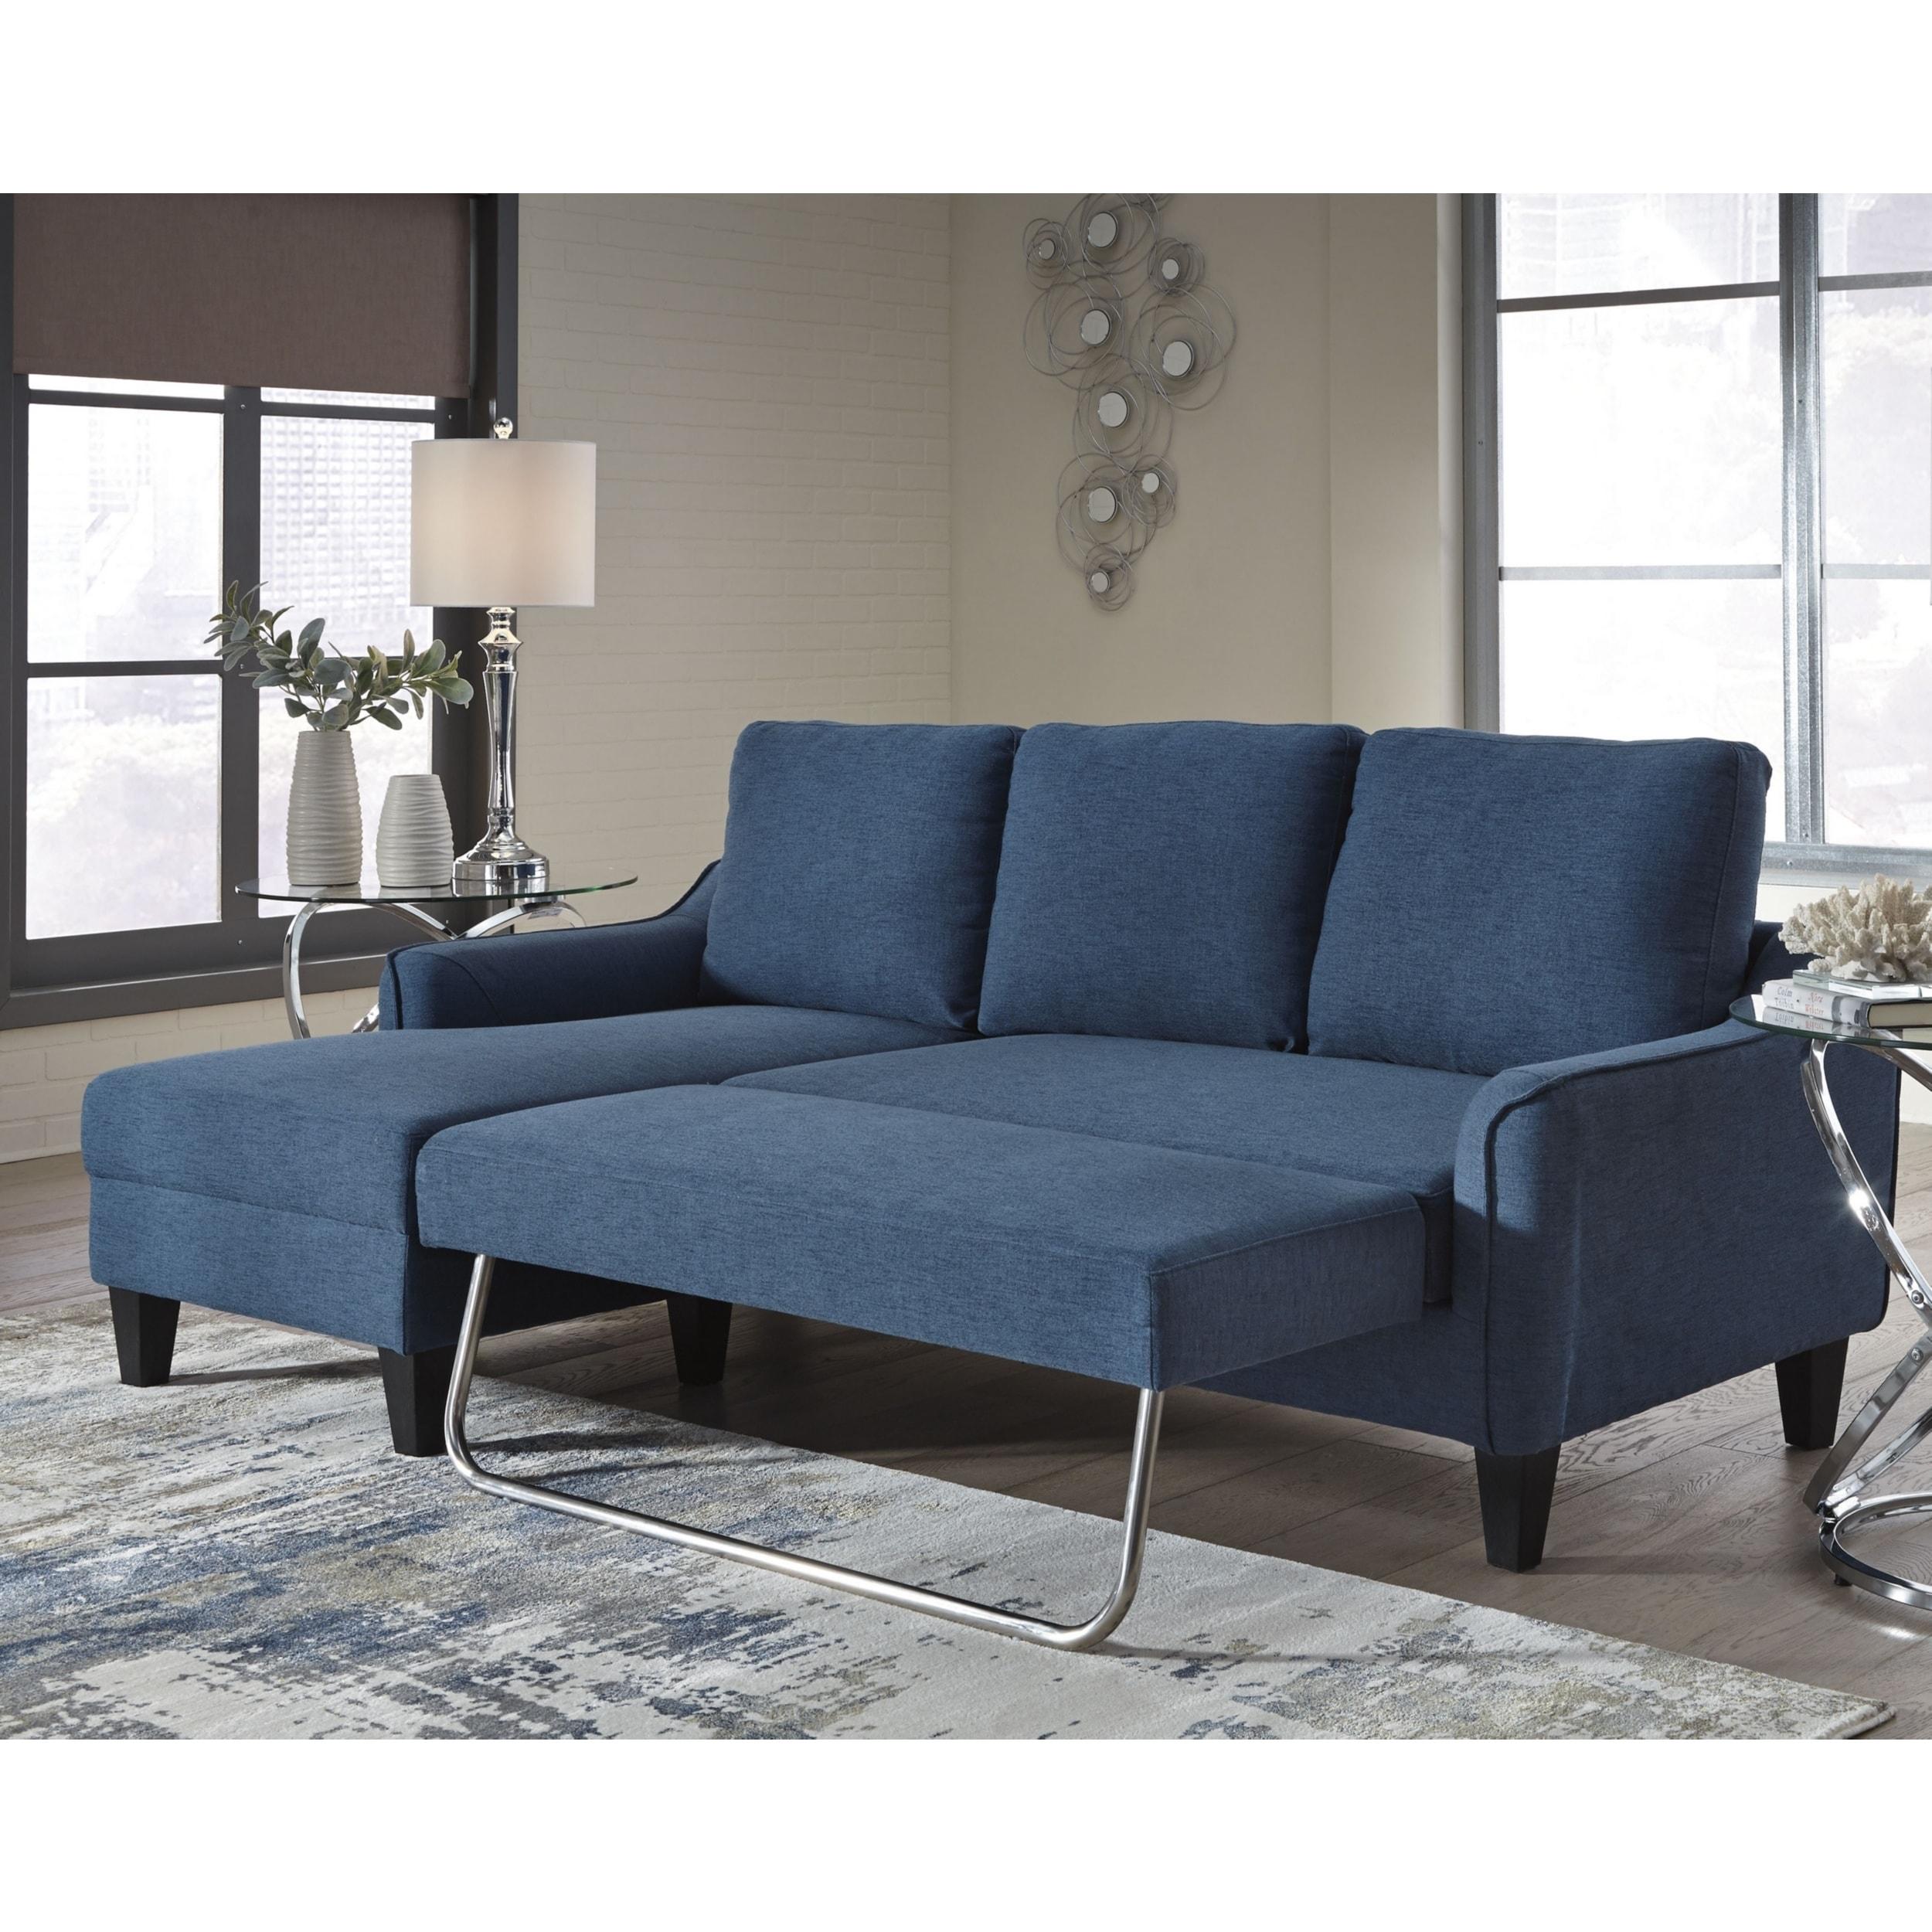 Jarreau Contemporary Blue Sofa Chaise Sleeper